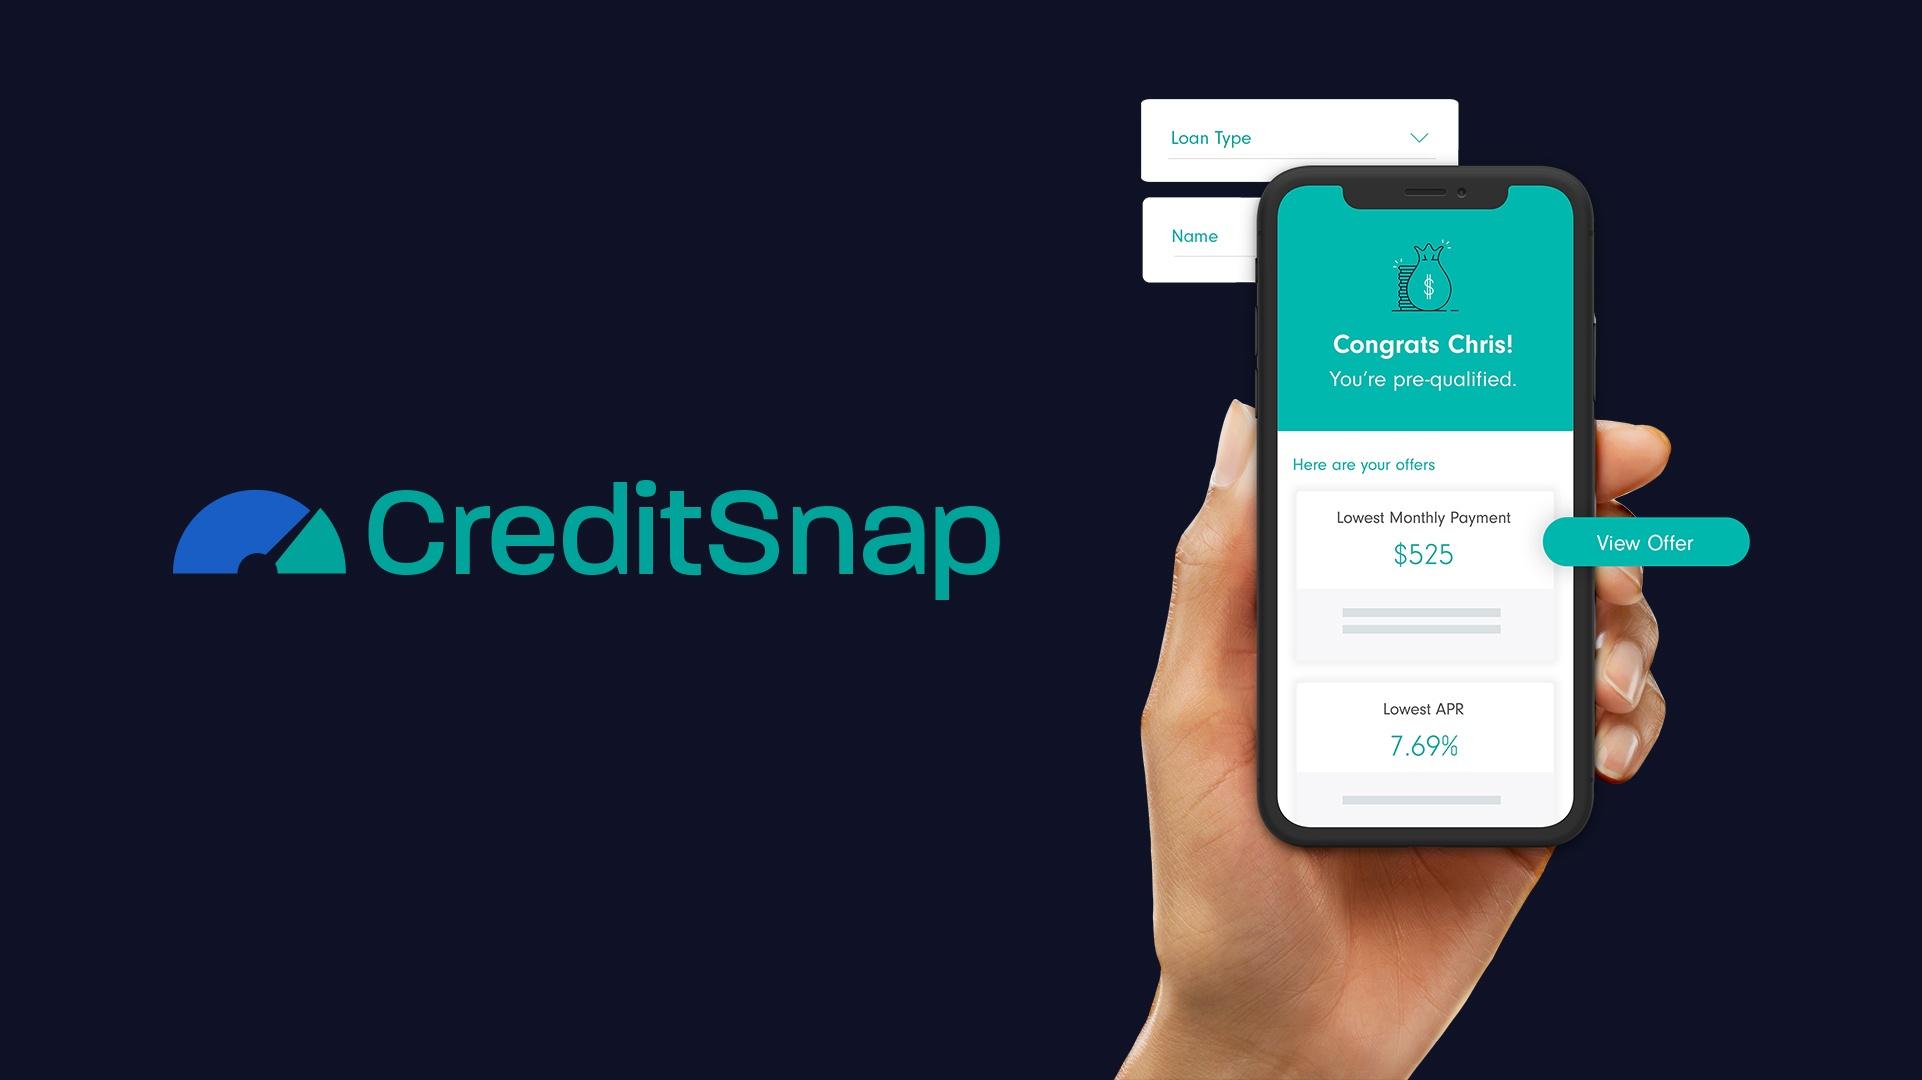 New CreditSnap logo and hand holding phone